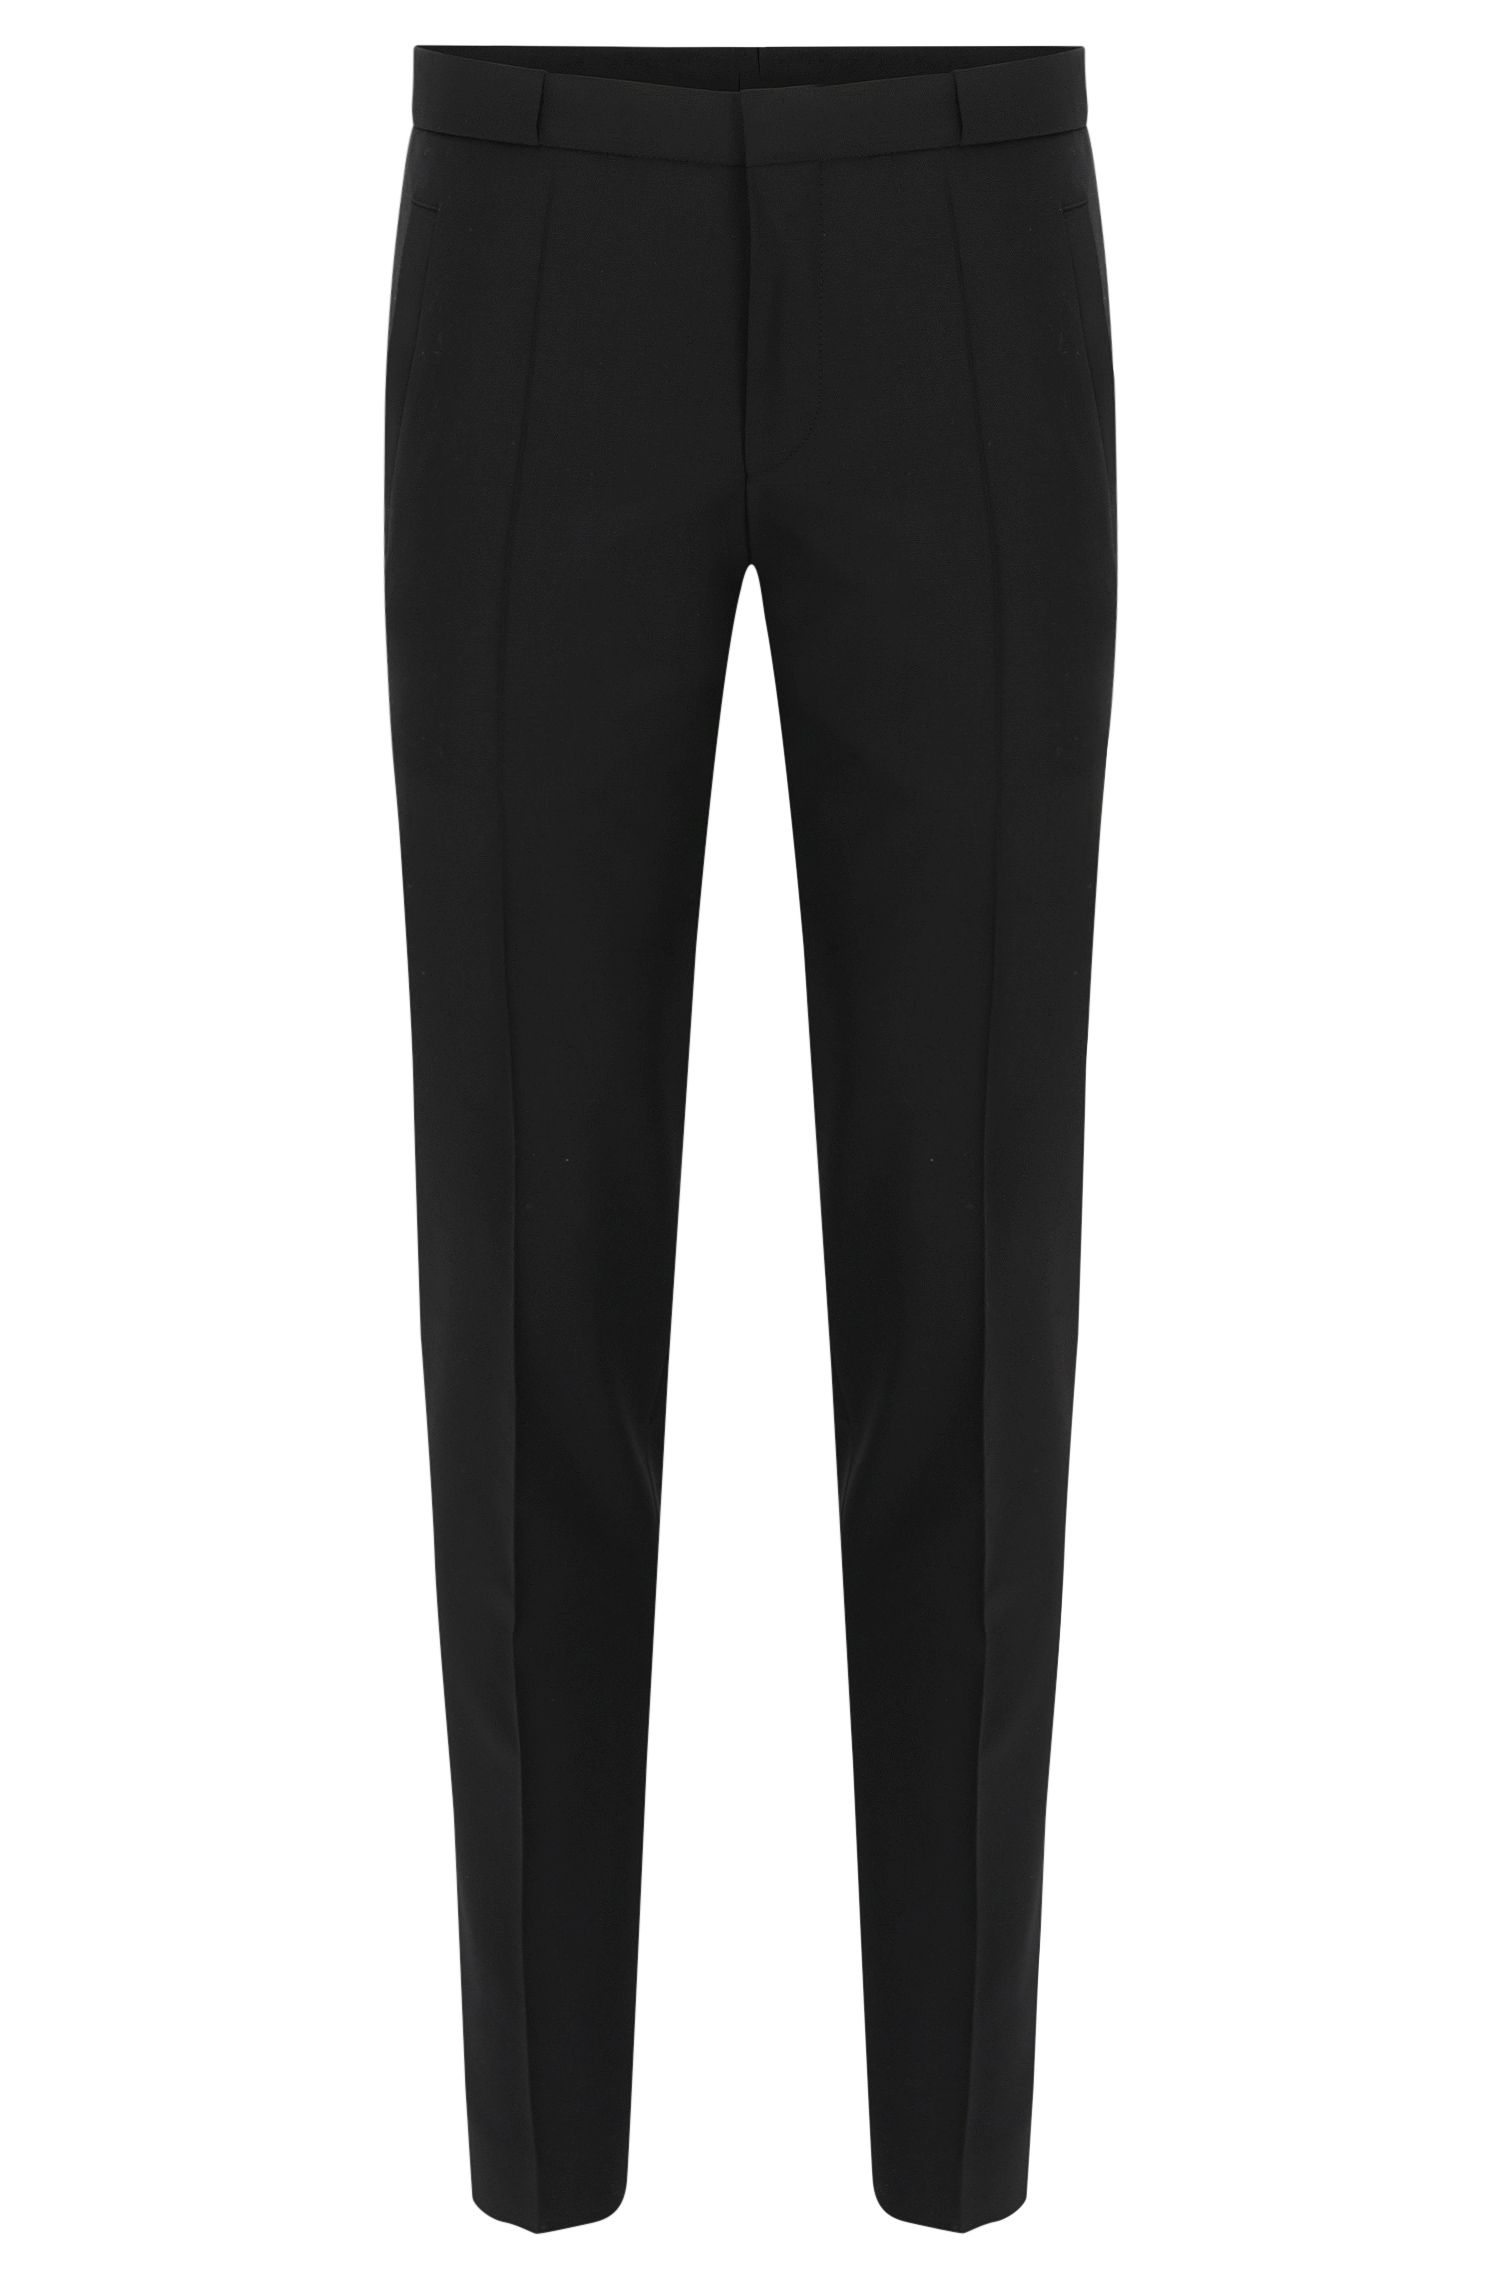 'Braydon' | Slim Fit, Virgin Wool Mohair Dress Pants